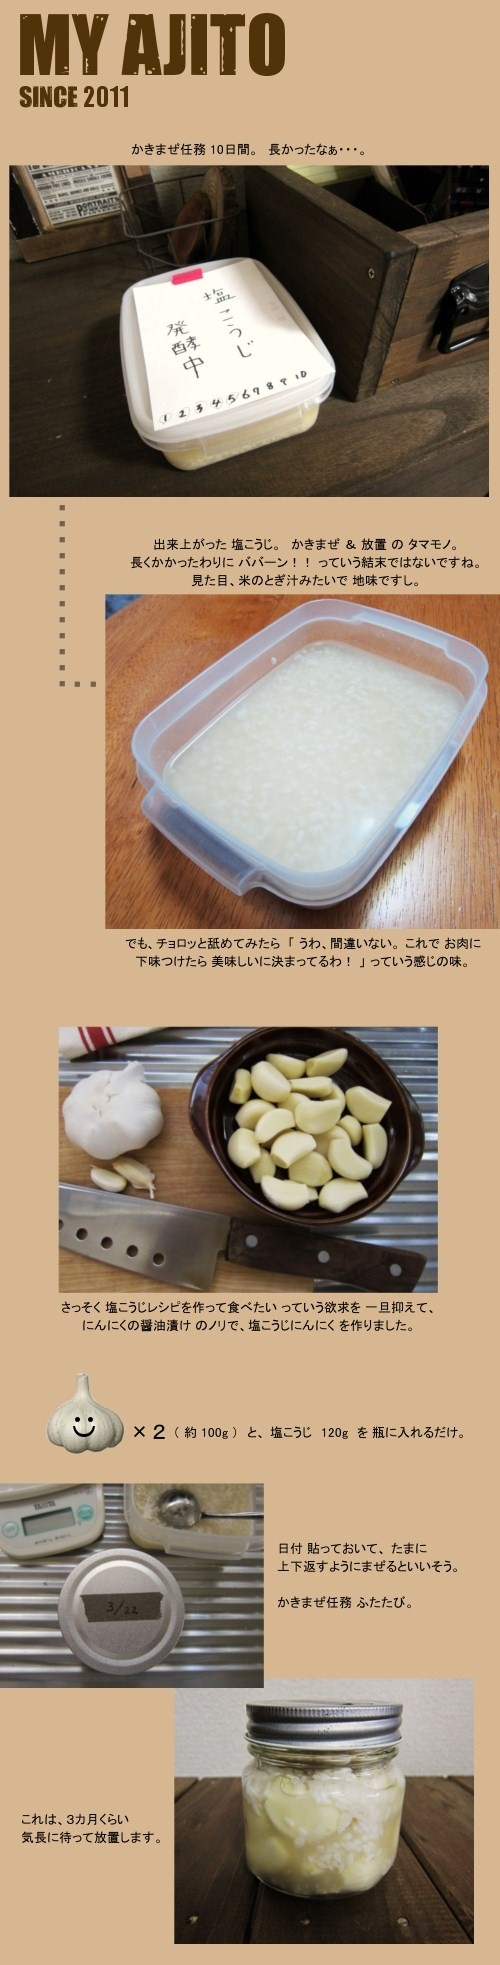 shioko_3.jpg